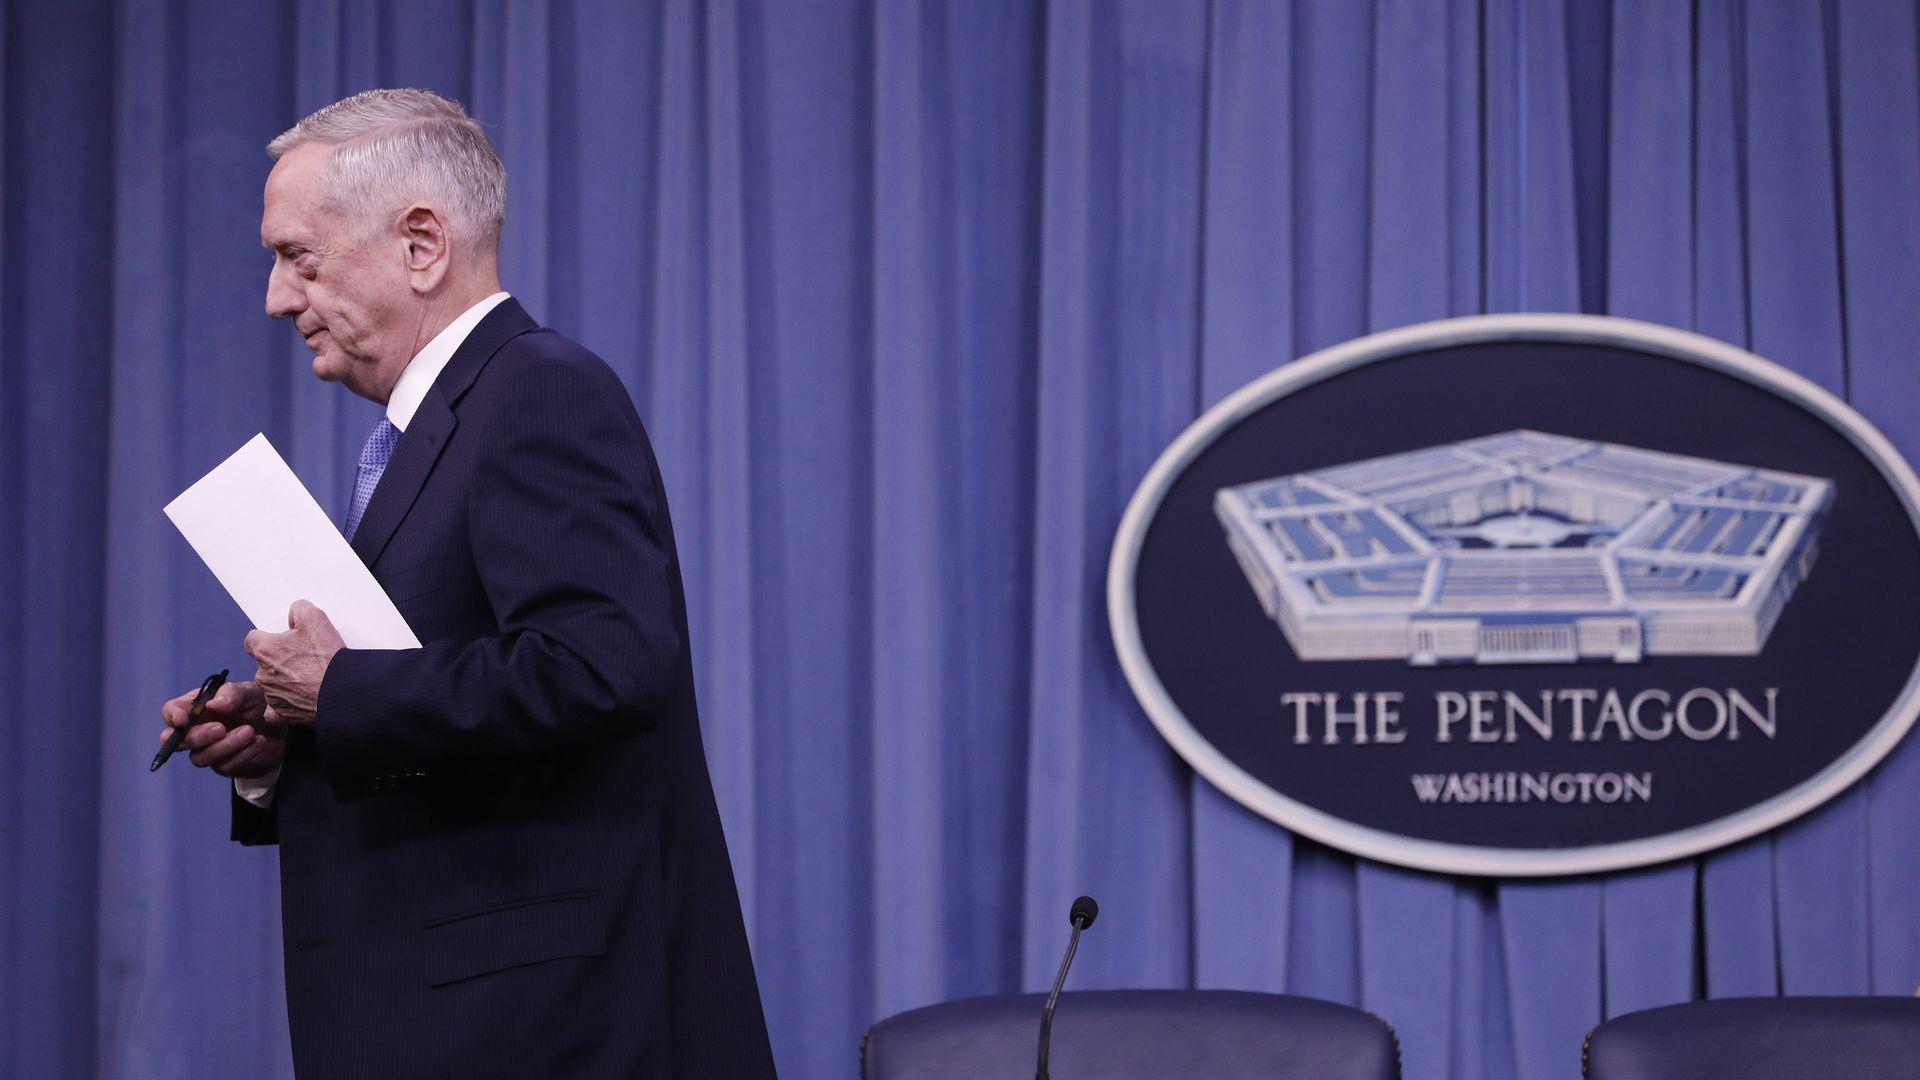 James Mattis leaving the podium at the Pentagon